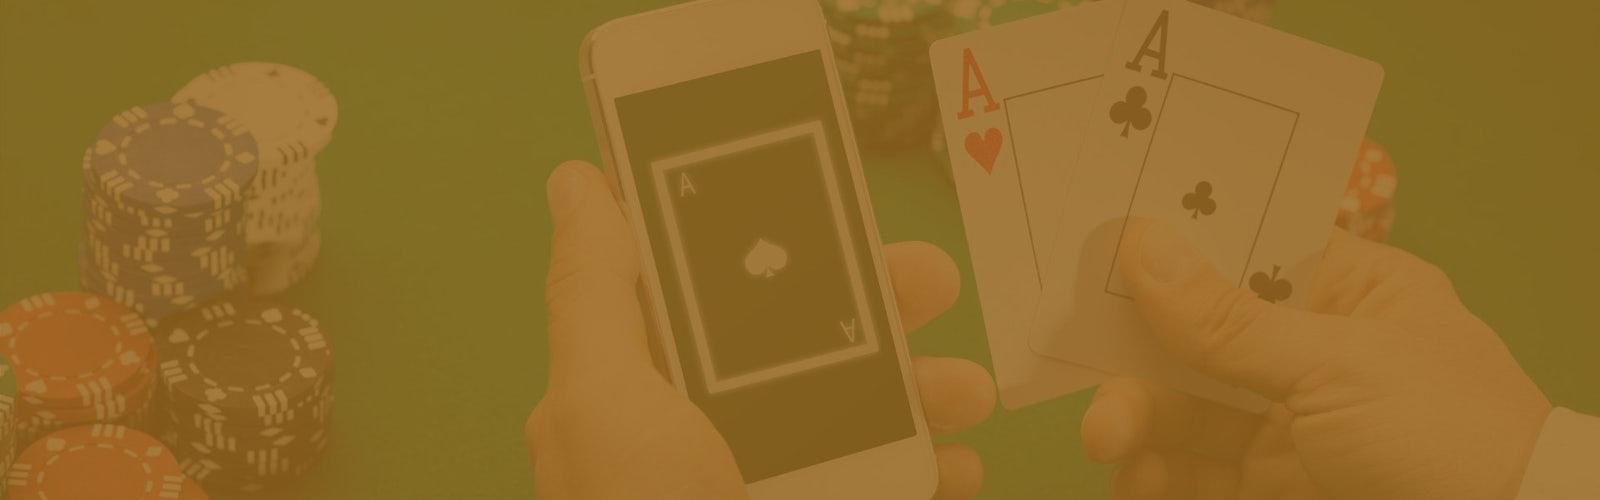 Casino apps 1